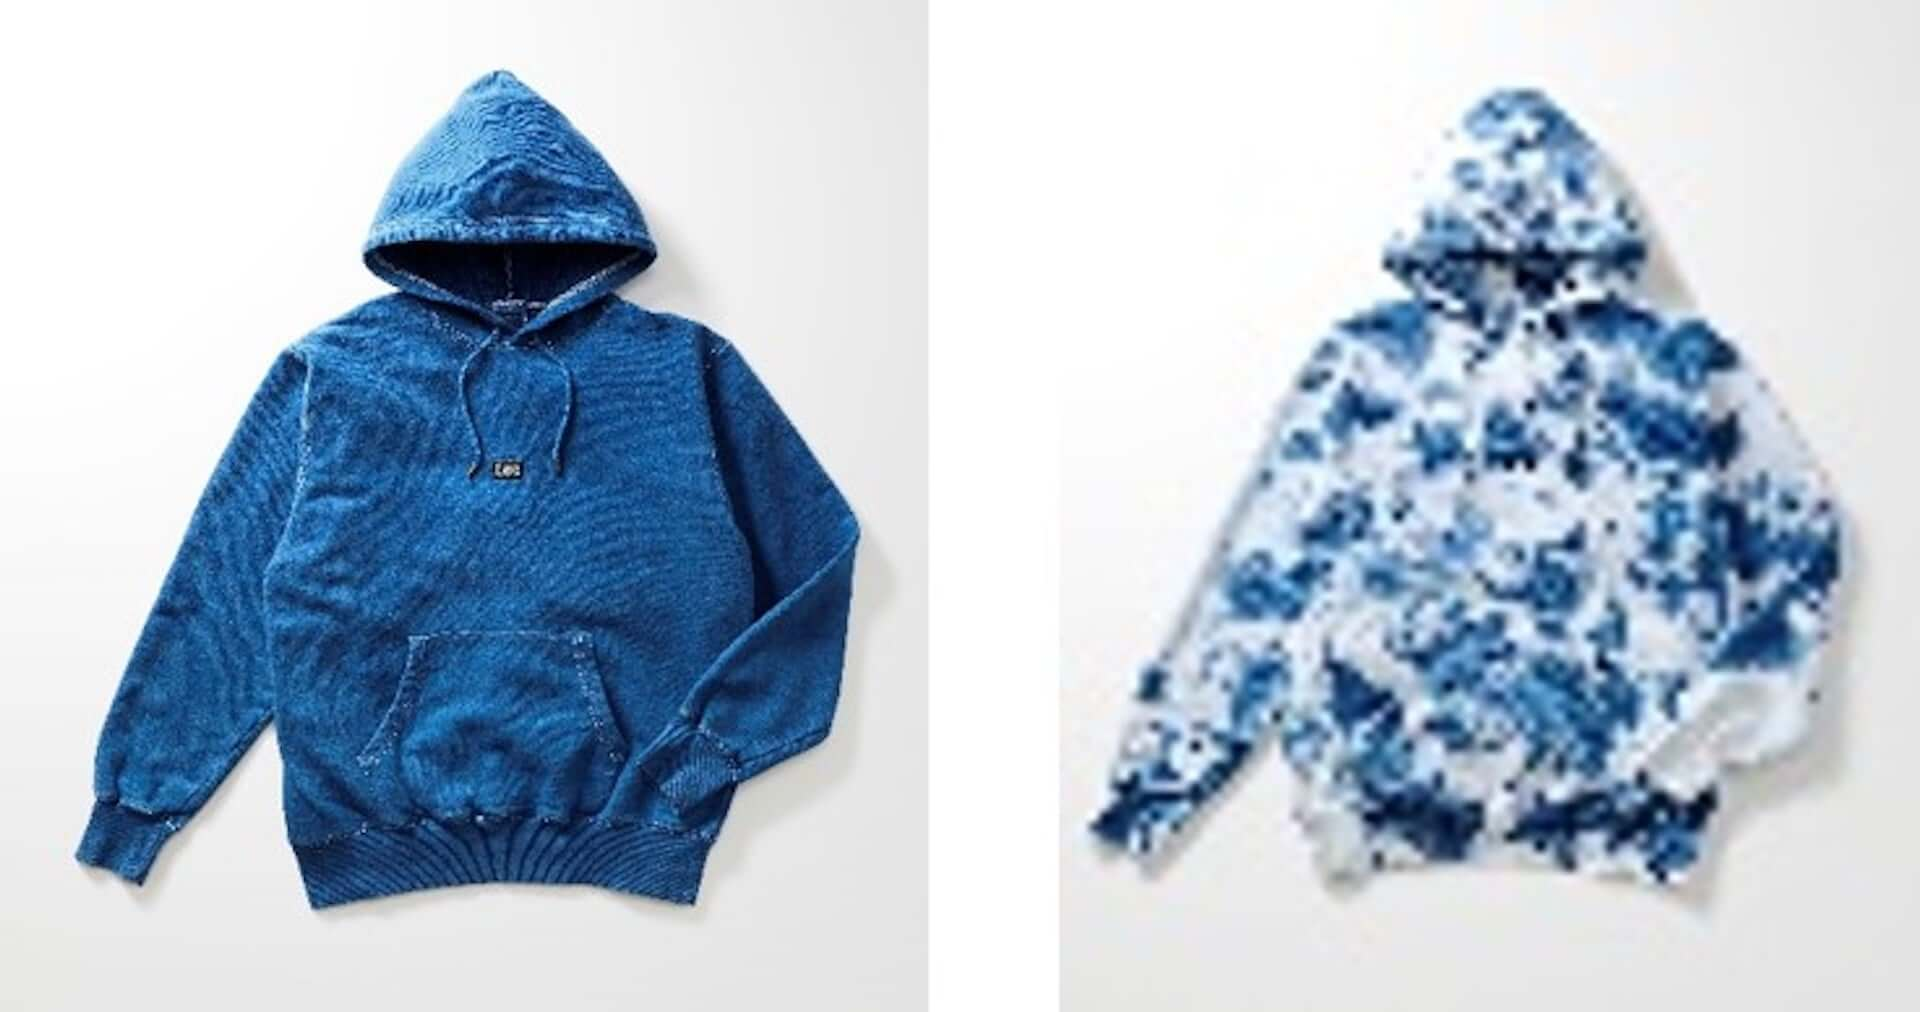 Lee原宿店で今夏注目の天然インディゴ染めTシャツやジャケットが移転1周年記念限定発売! lf200529_lee_indigo_4-1920x1012